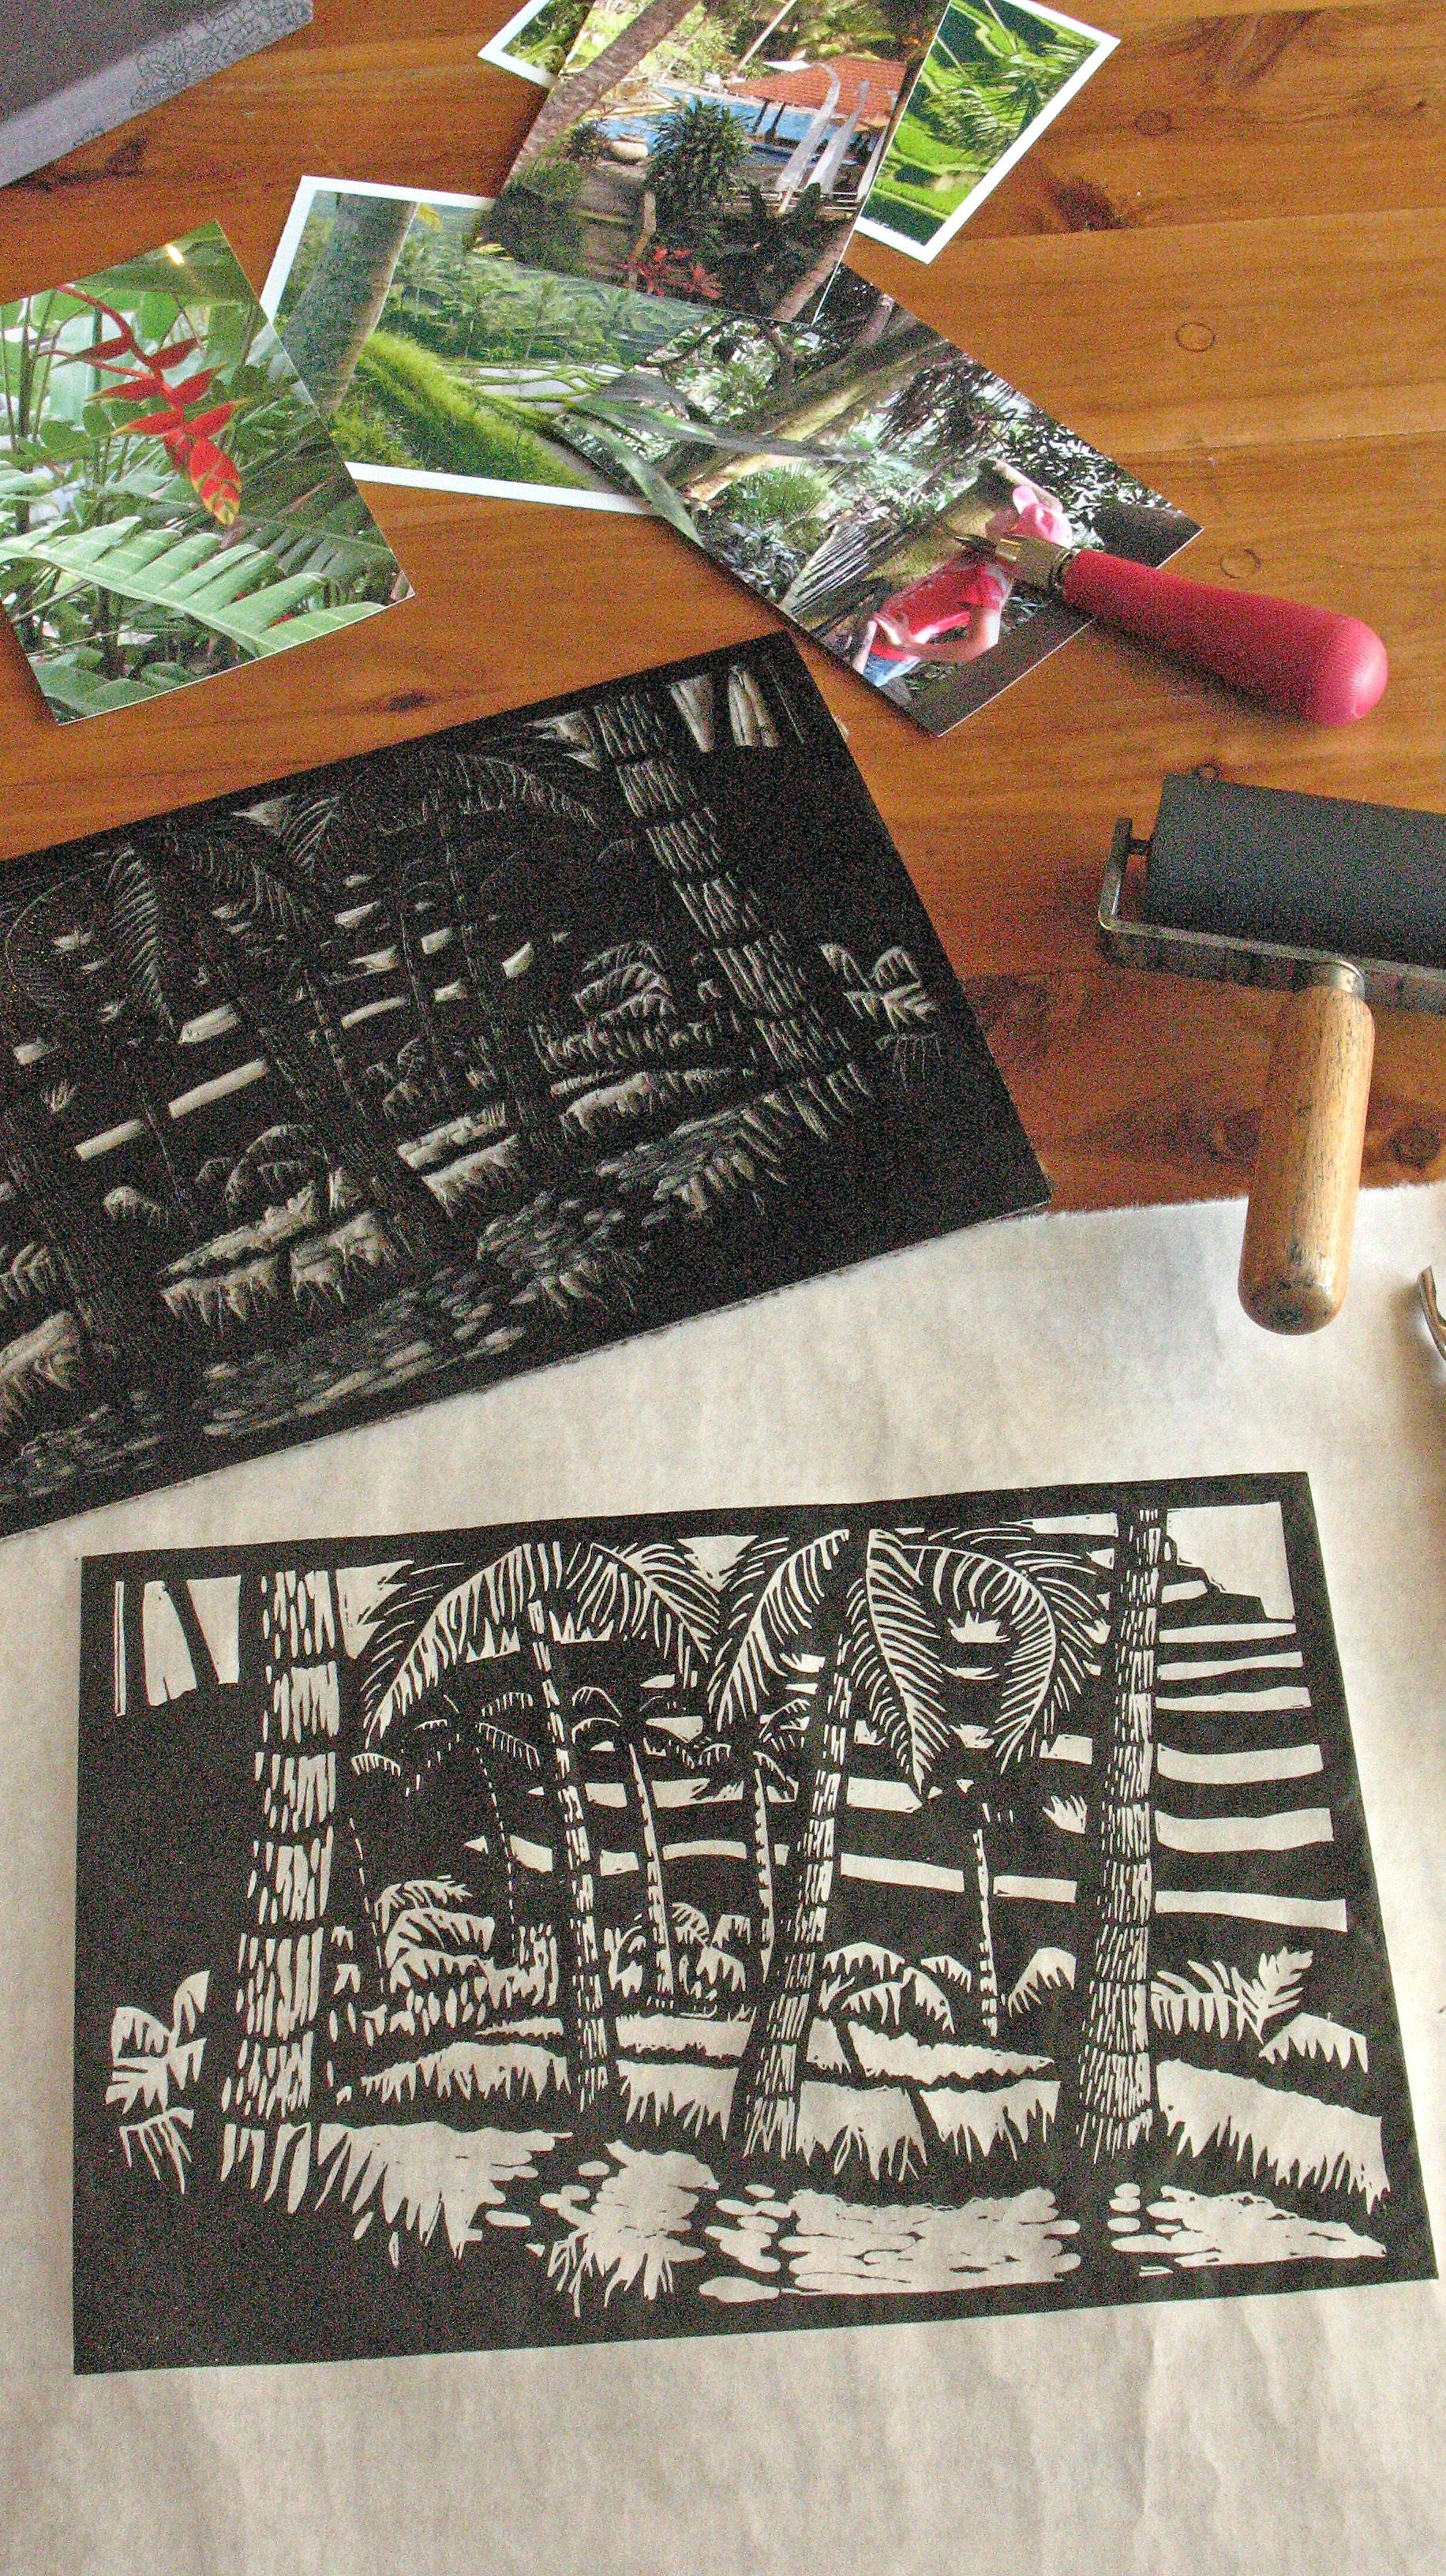 Linocut of Ubud Landscape with Lino block